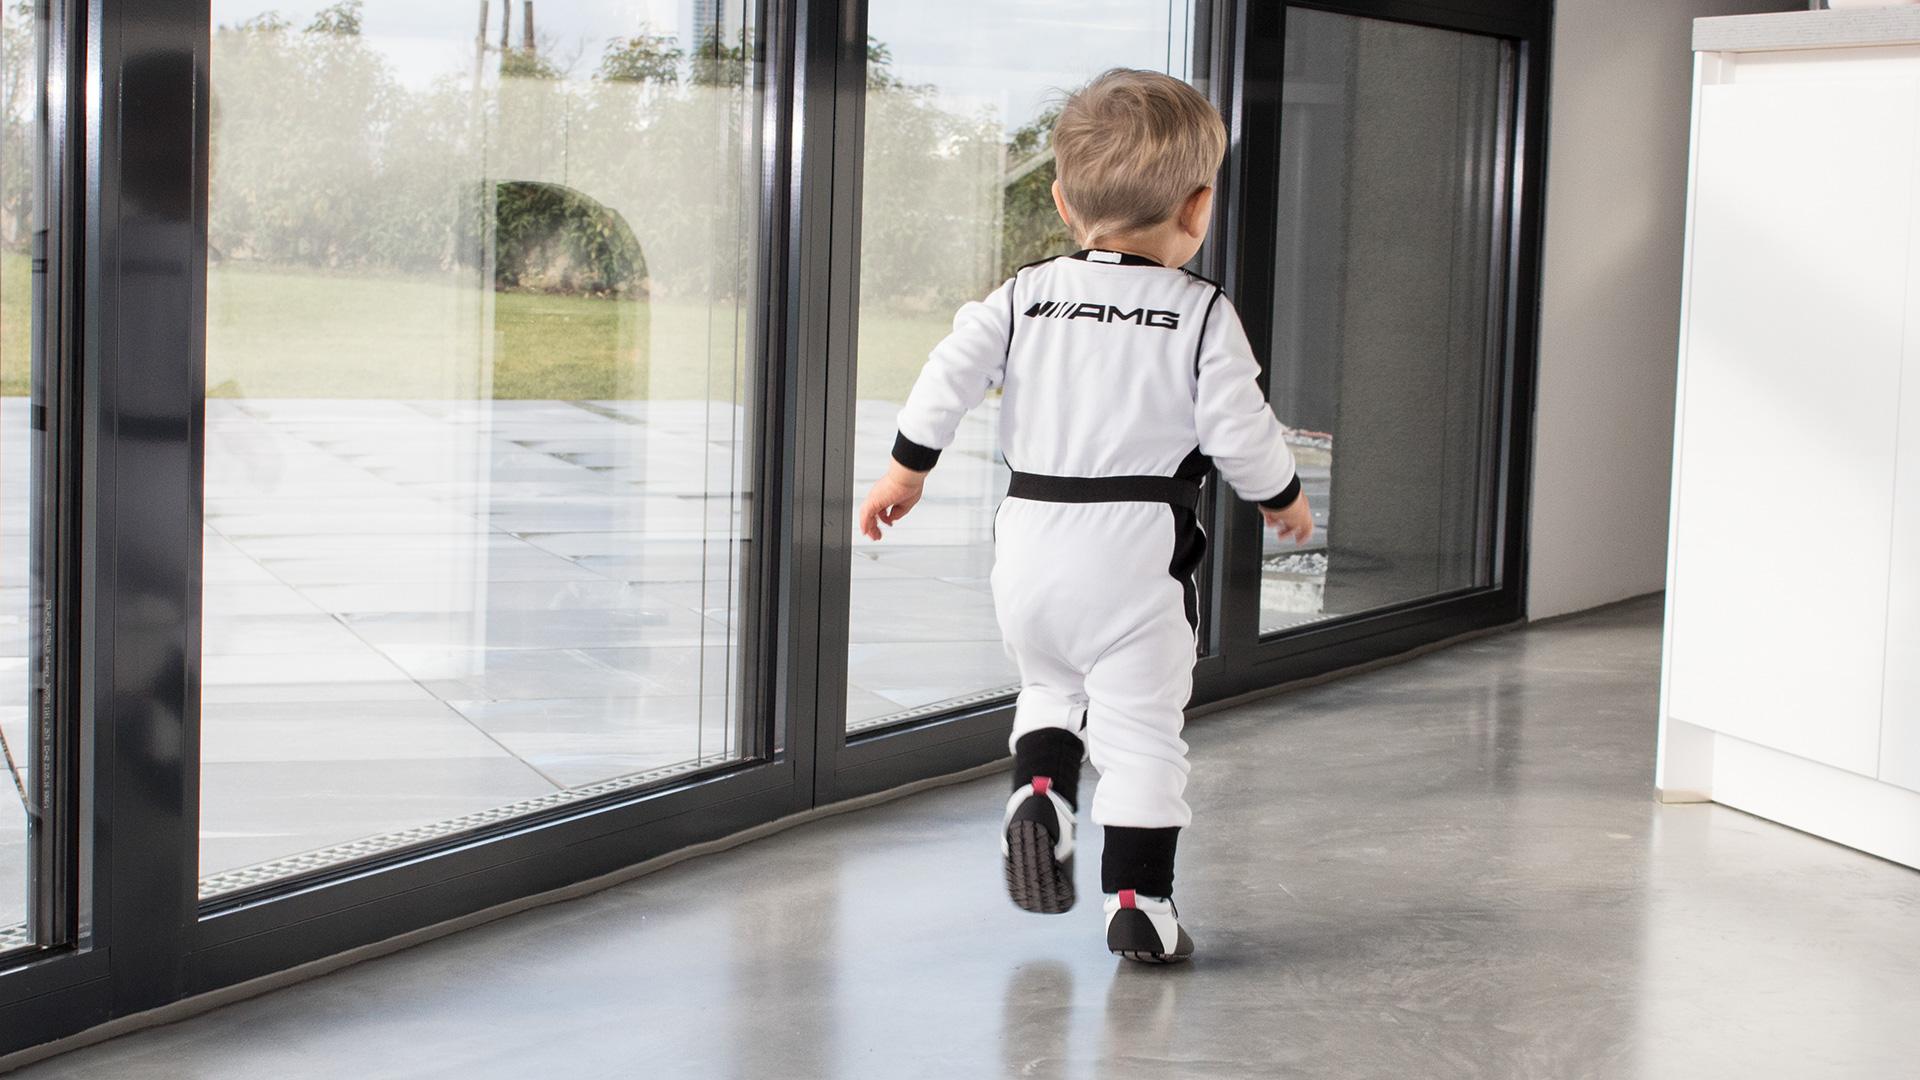 AMG Kinder Kollektion Sonderproduktion Werbeartikel Full Service